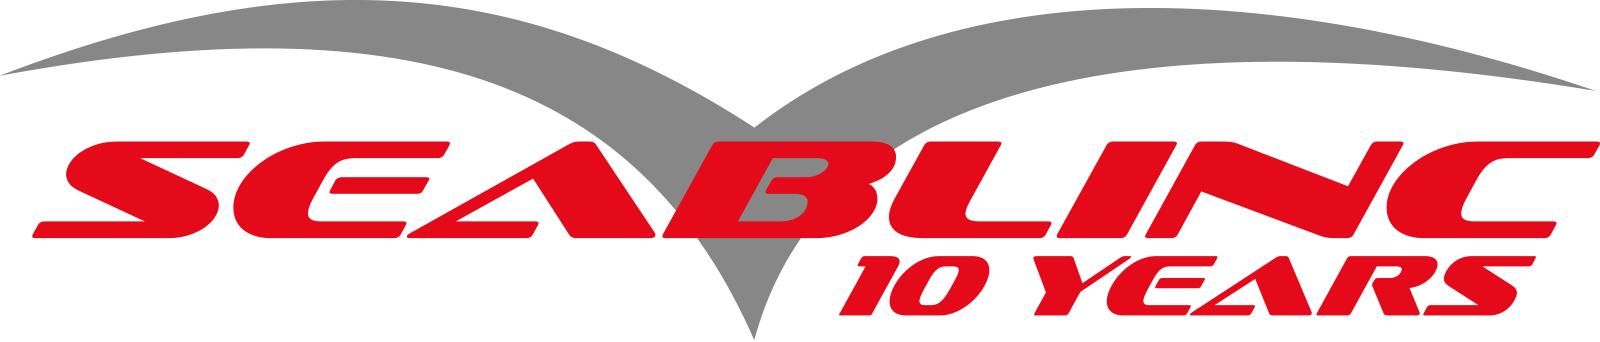 logo_seablinc-10-years